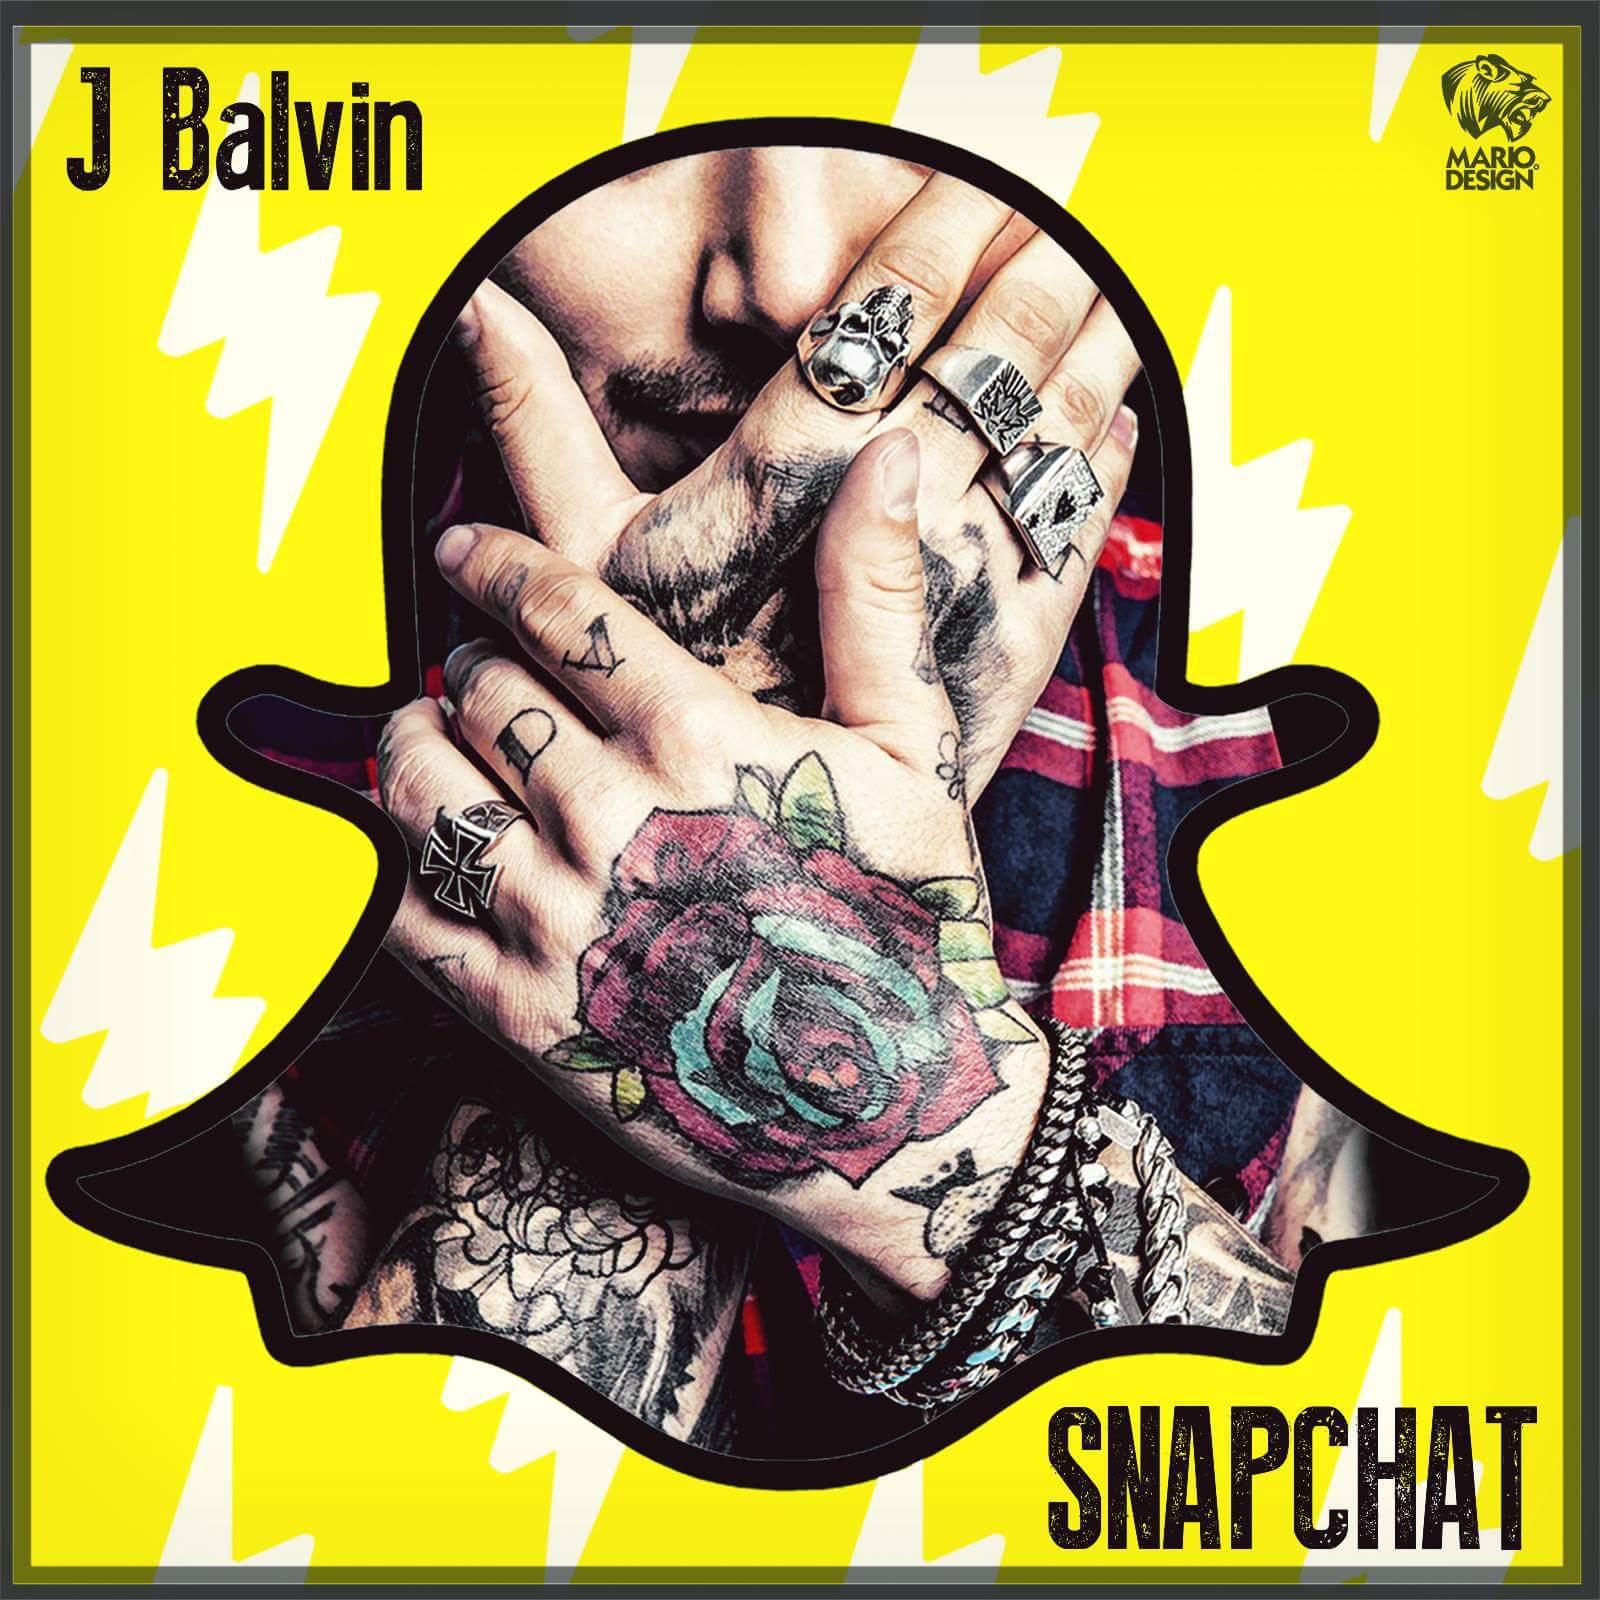 watch J Balvin videos at hiphop mundo